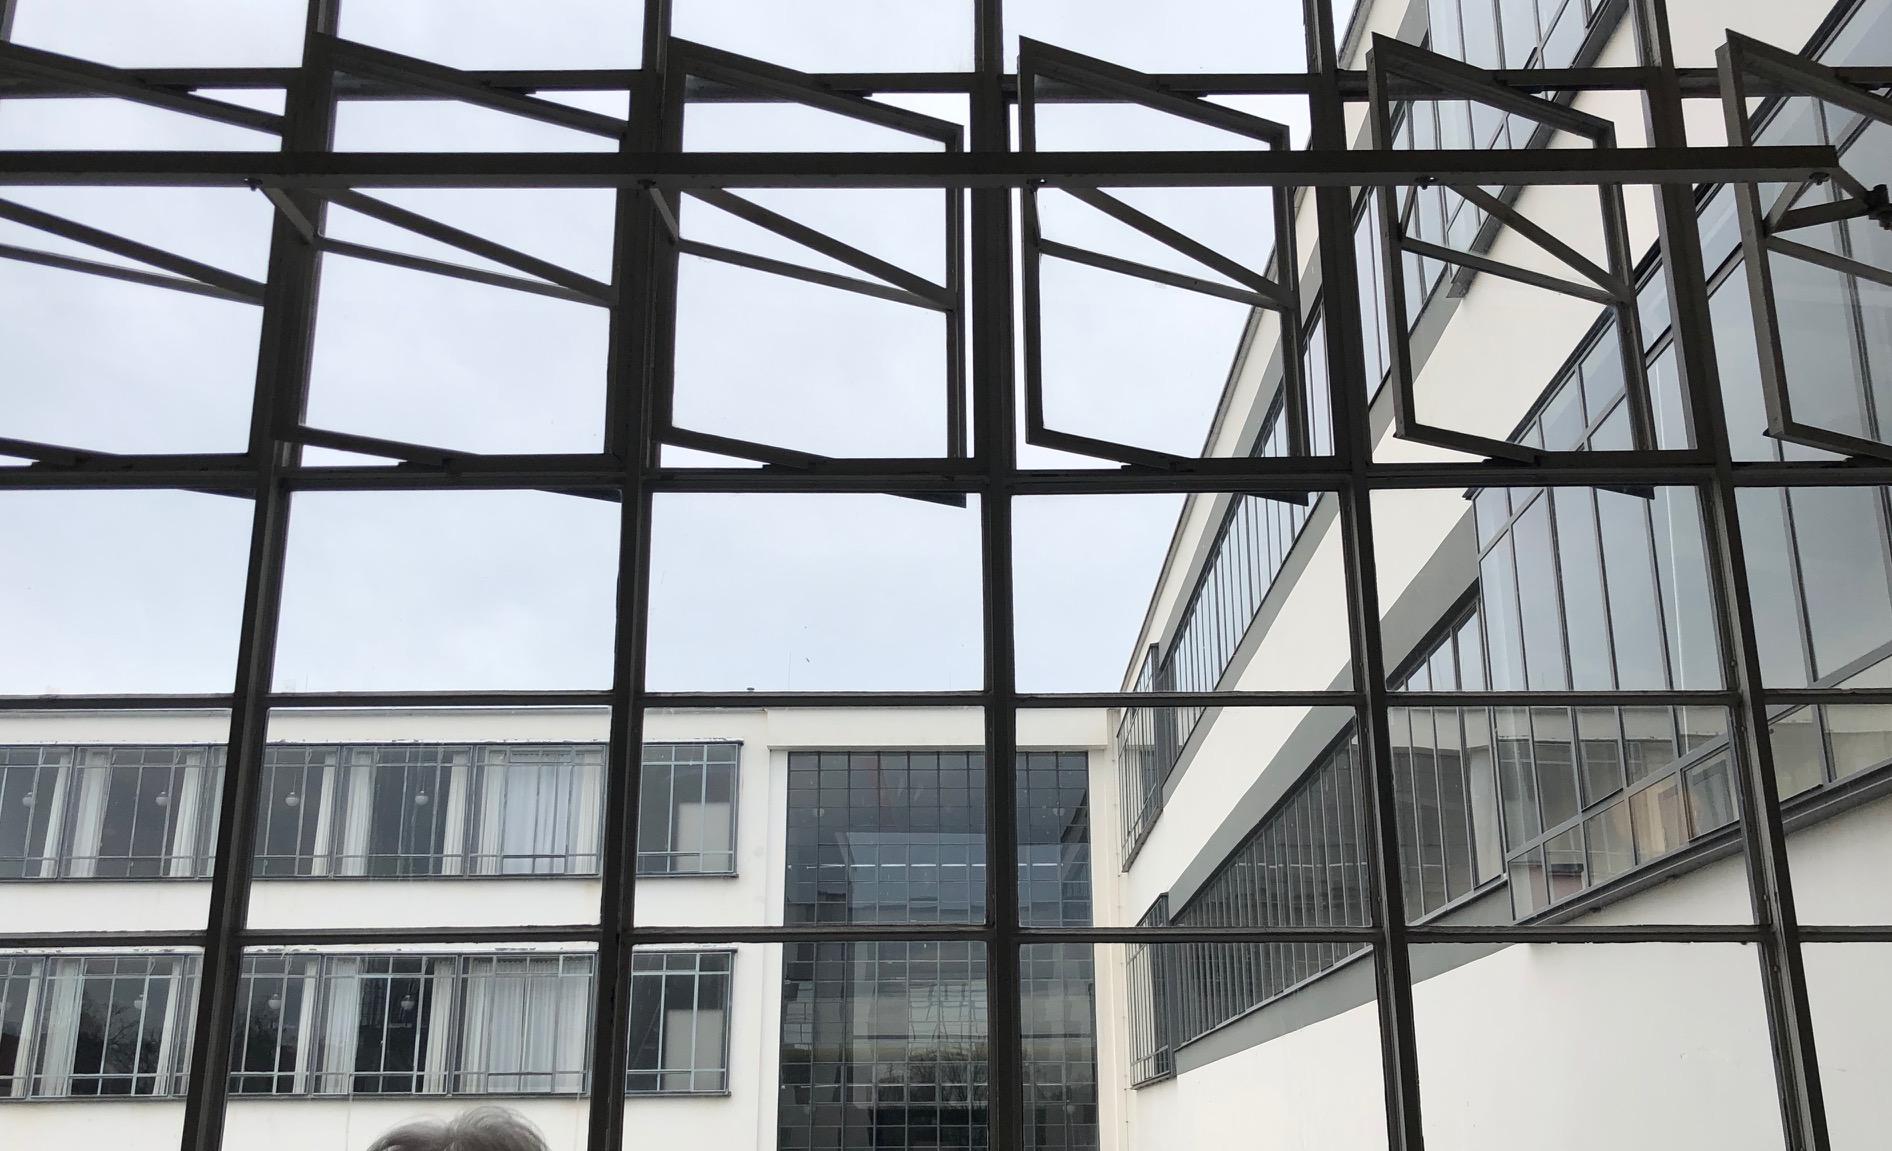 Fensterkonstruktion Hochschule Dessau